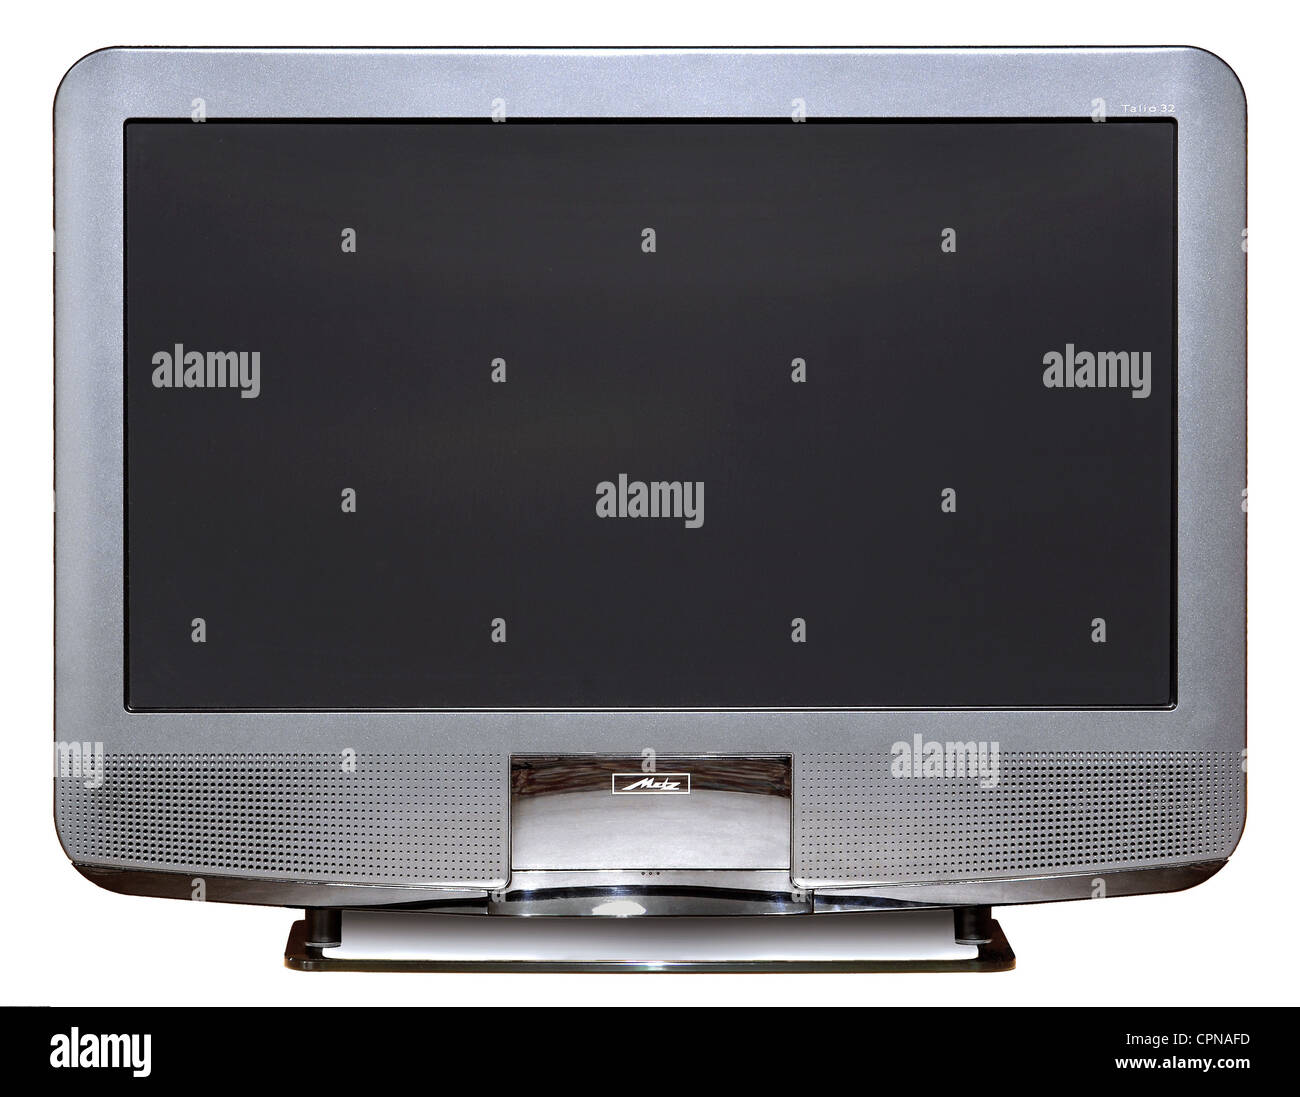 broadcast, television, television set, Metz Talio 32, LCD TV, screen diagonal: 81 centimeter, original price: 1.998 - Stock Image